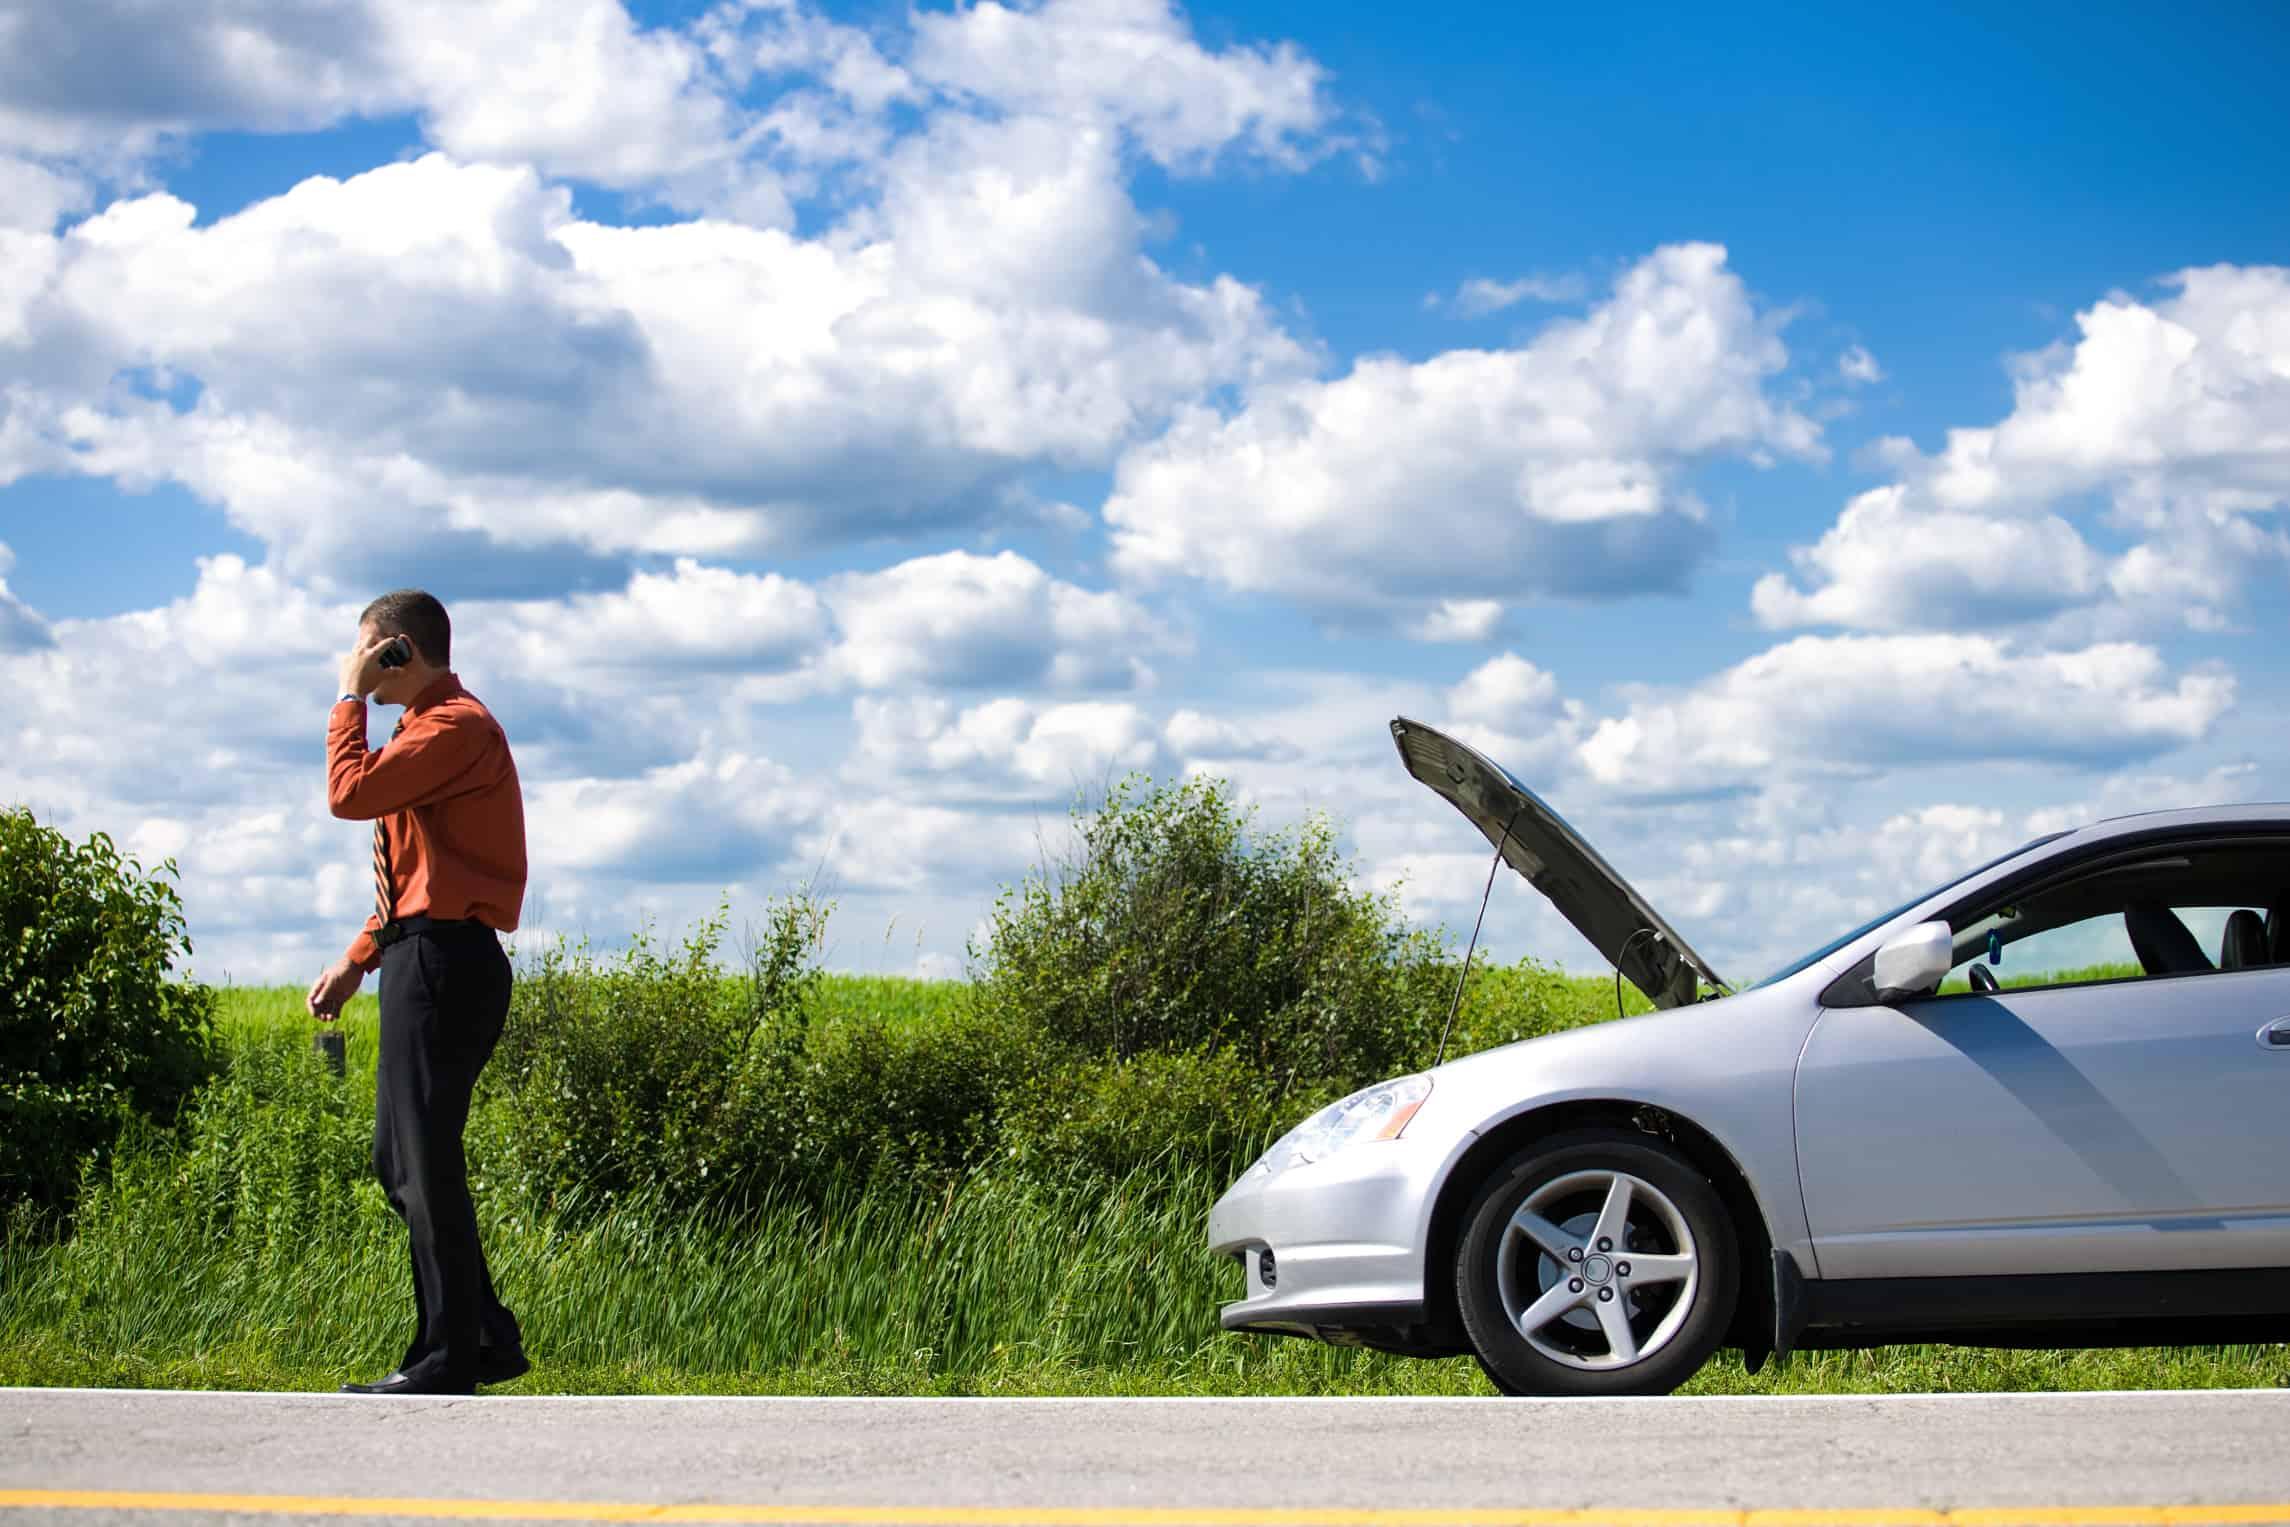 Paragon Motor Club – roadside assistance